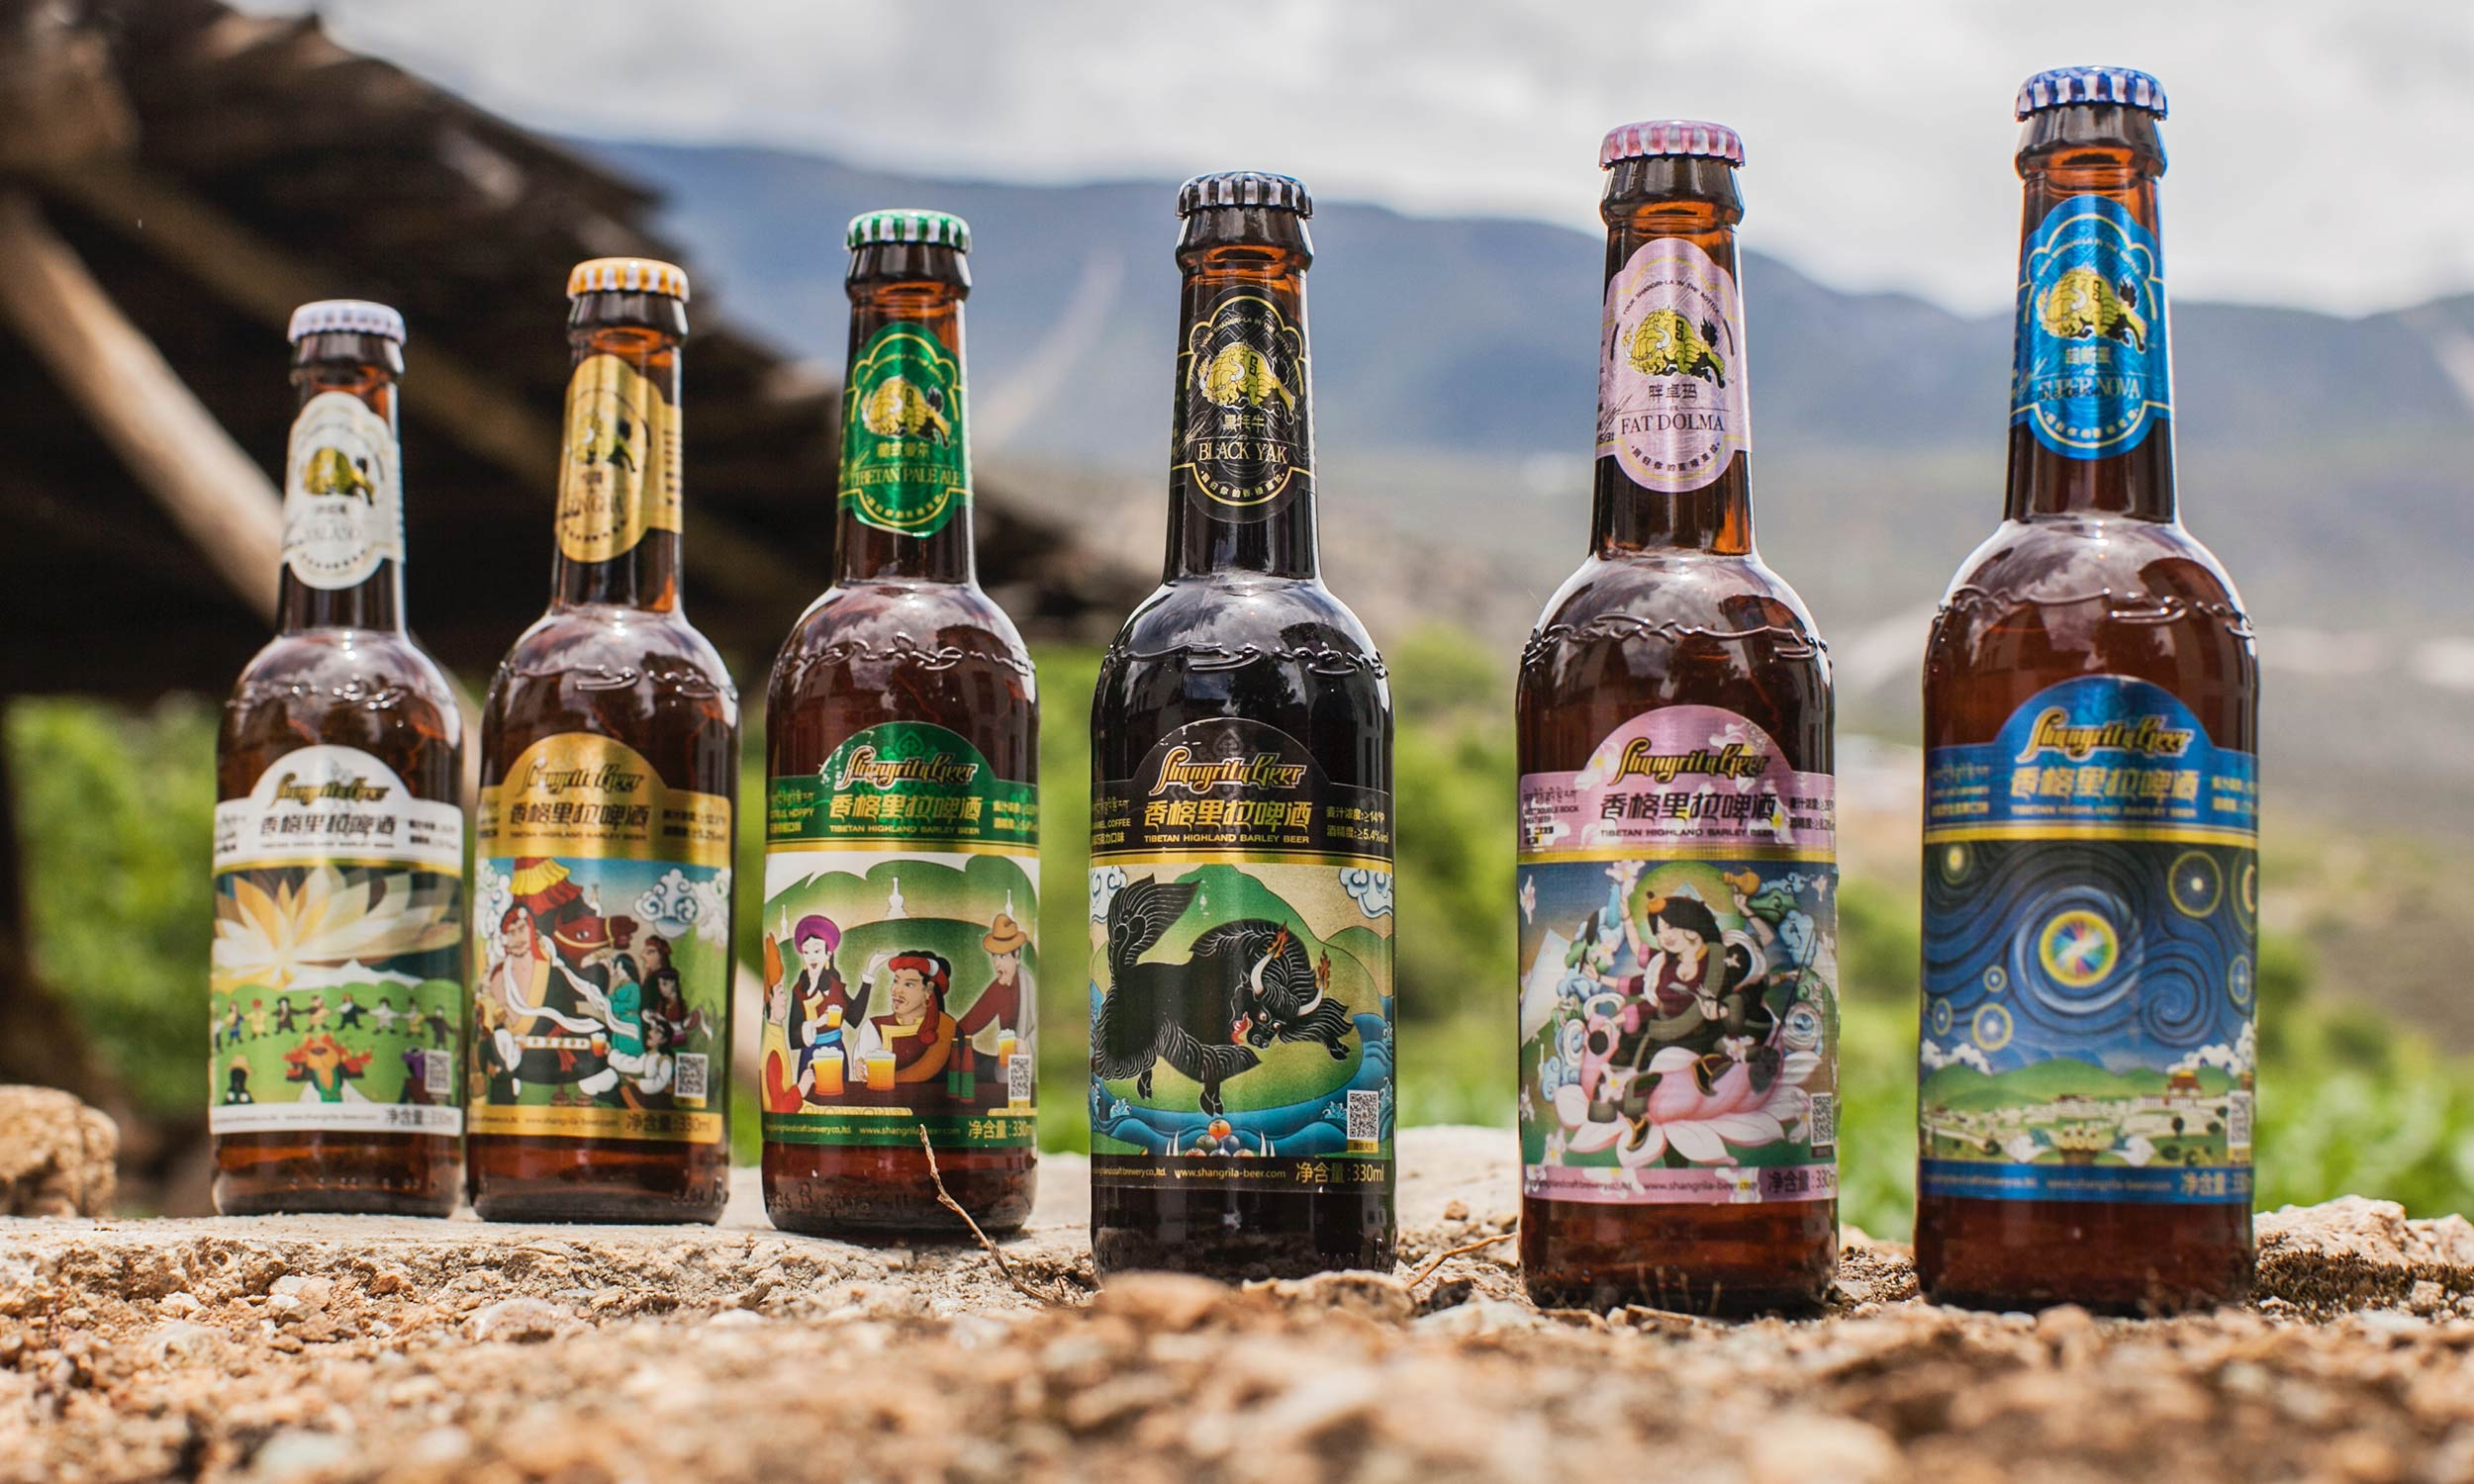 Shangri-La Beer's lineup.